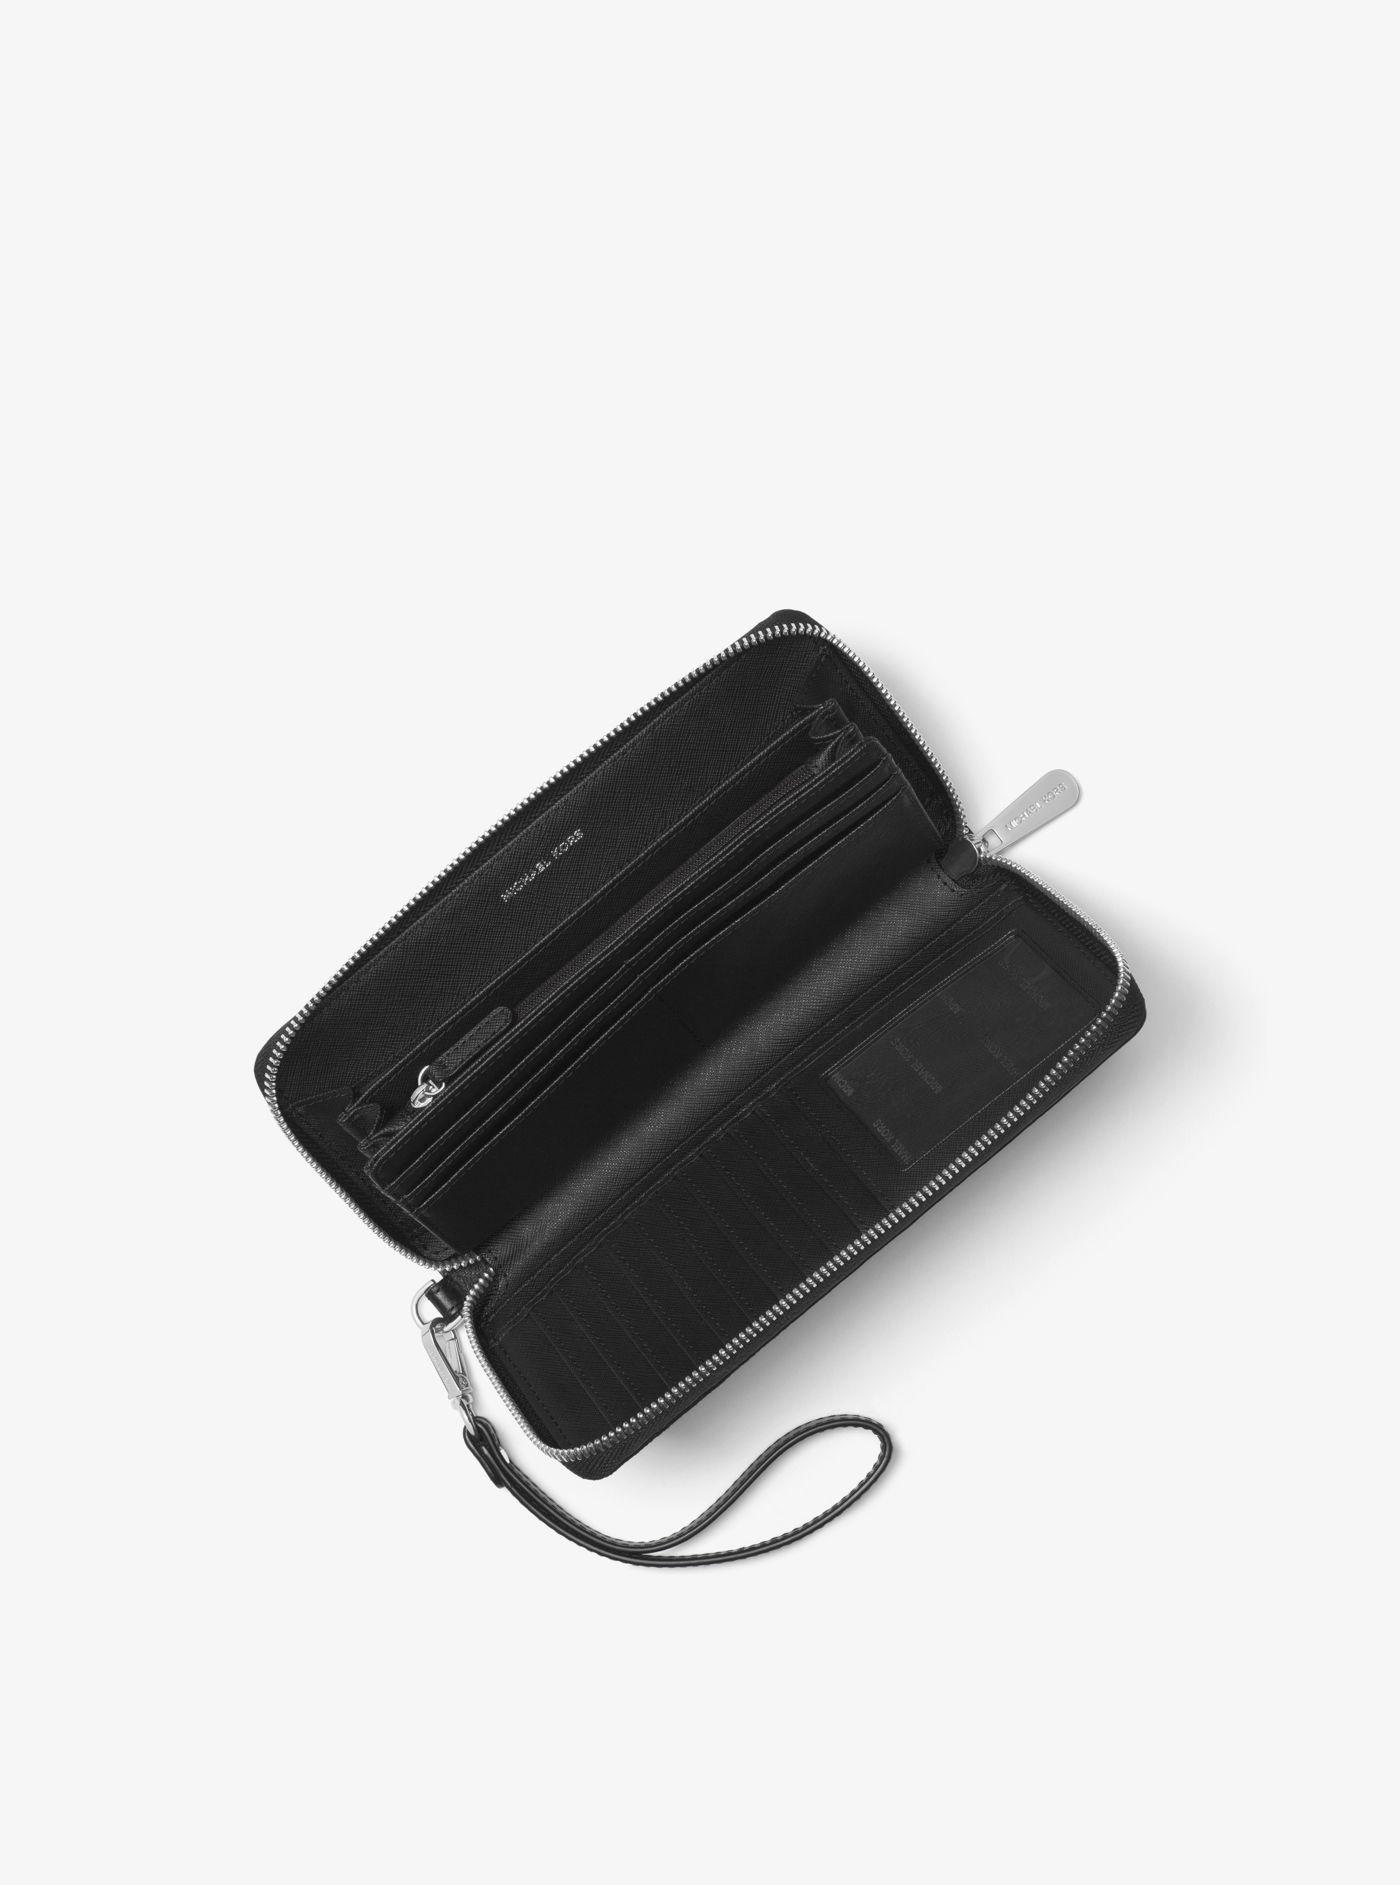 dfd753318630 Michael Kors - Black Logo Continental Wristlet - Lyst. View fullscreen